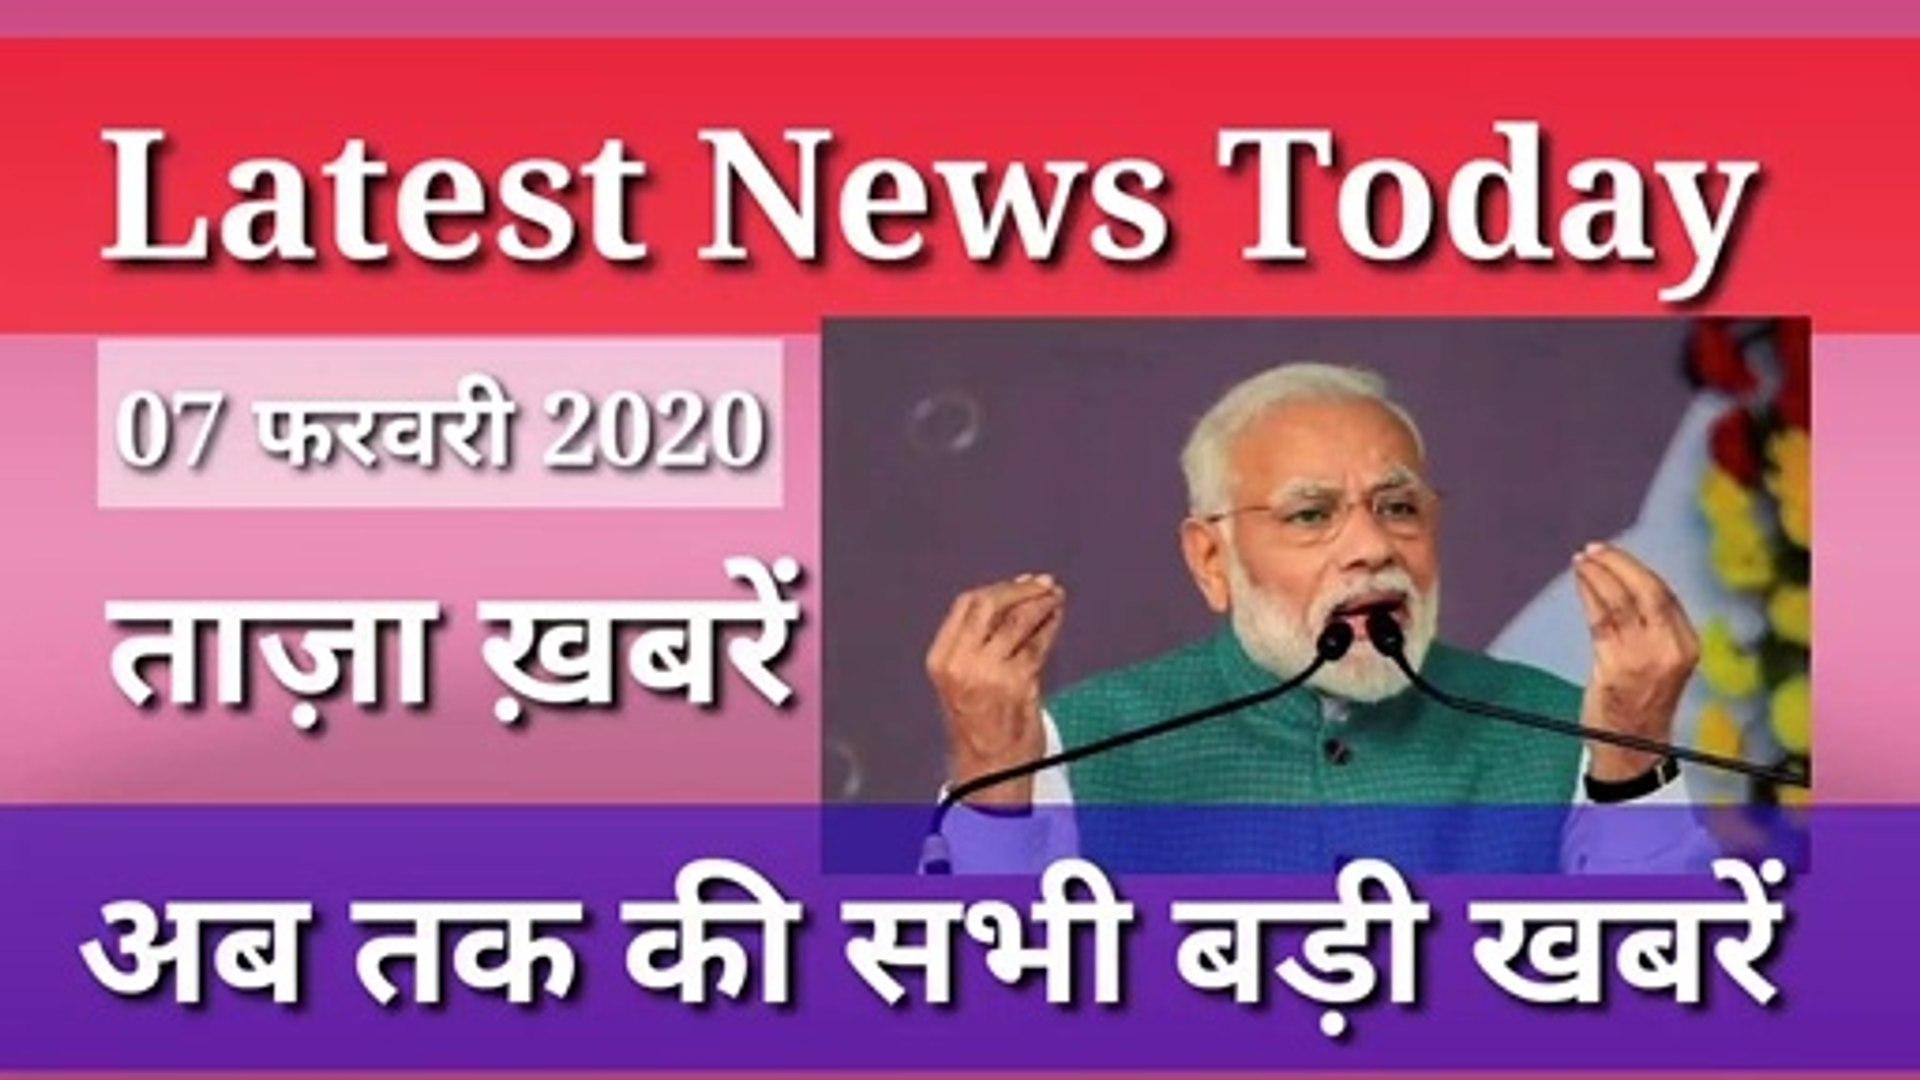 07 February 2020 : Morning News | Latest News Today |  Today News | Hindi News | India News